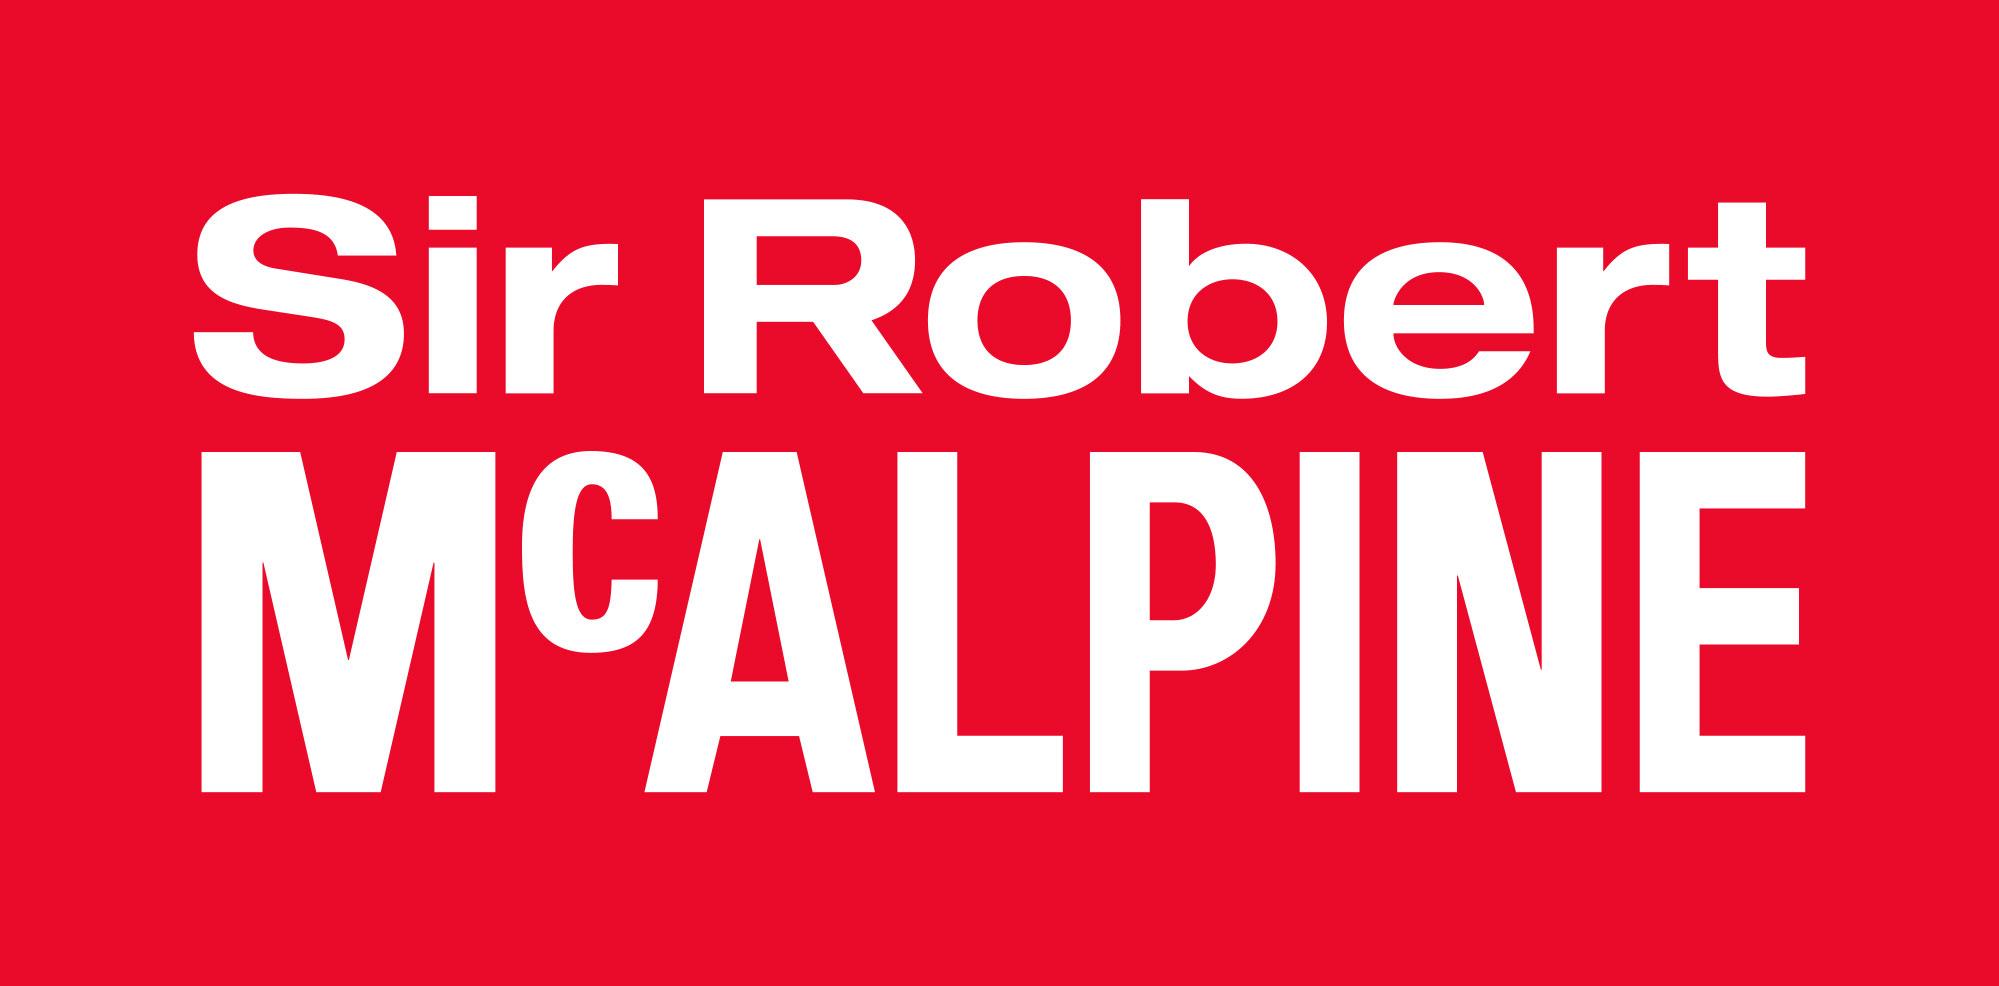 Sir Robert McAlpine - Wikipedia